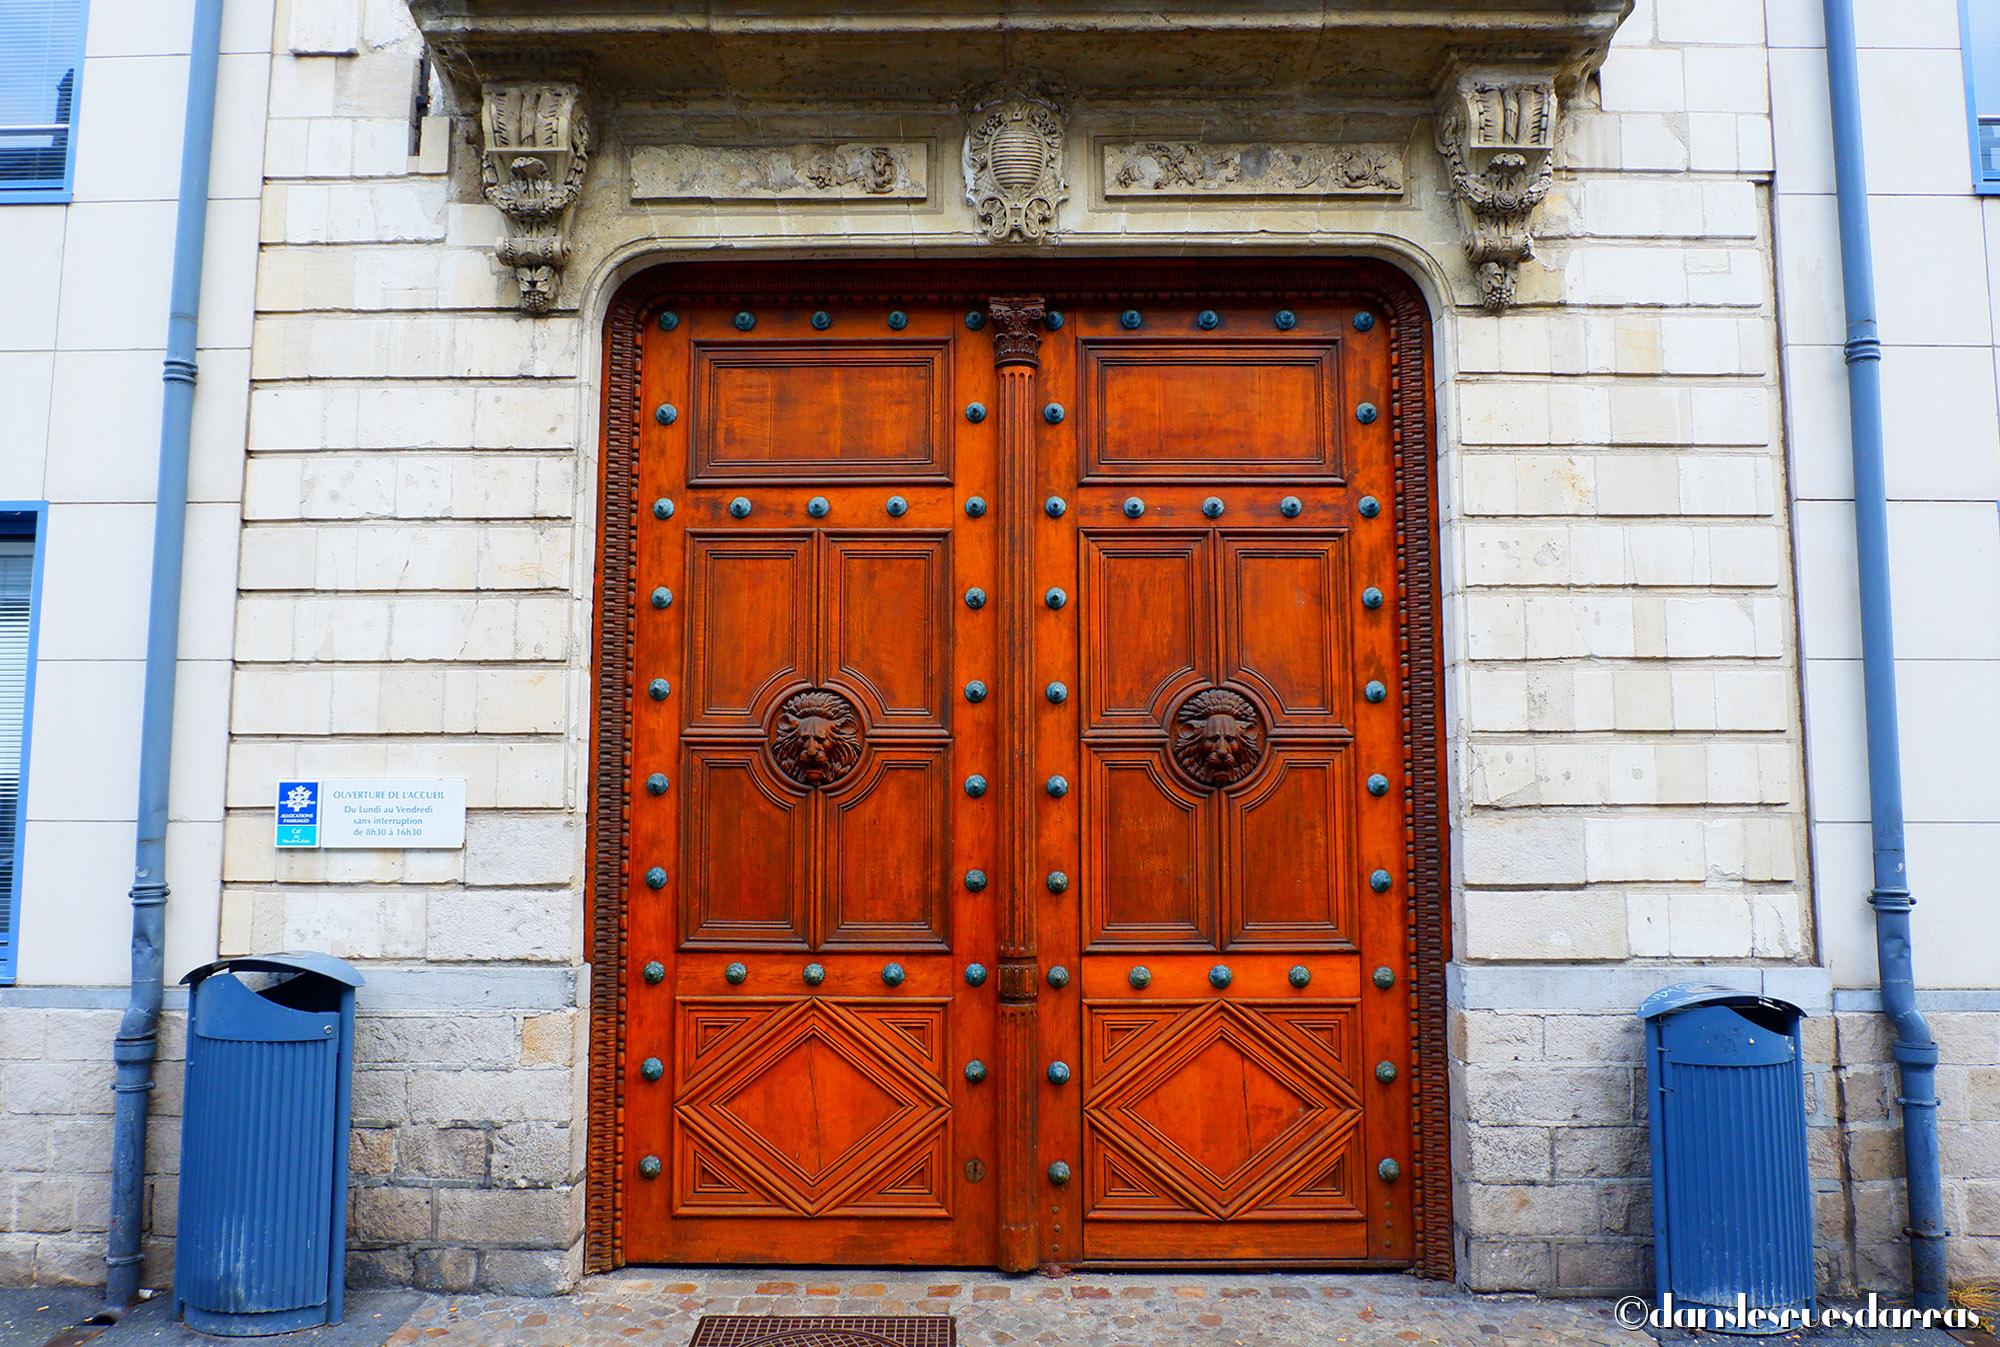 Hôtel du refuge de l'abbaye d'Arrouaise - 5 rue des Promenades - Arras (©MD - danslesruesdarras)